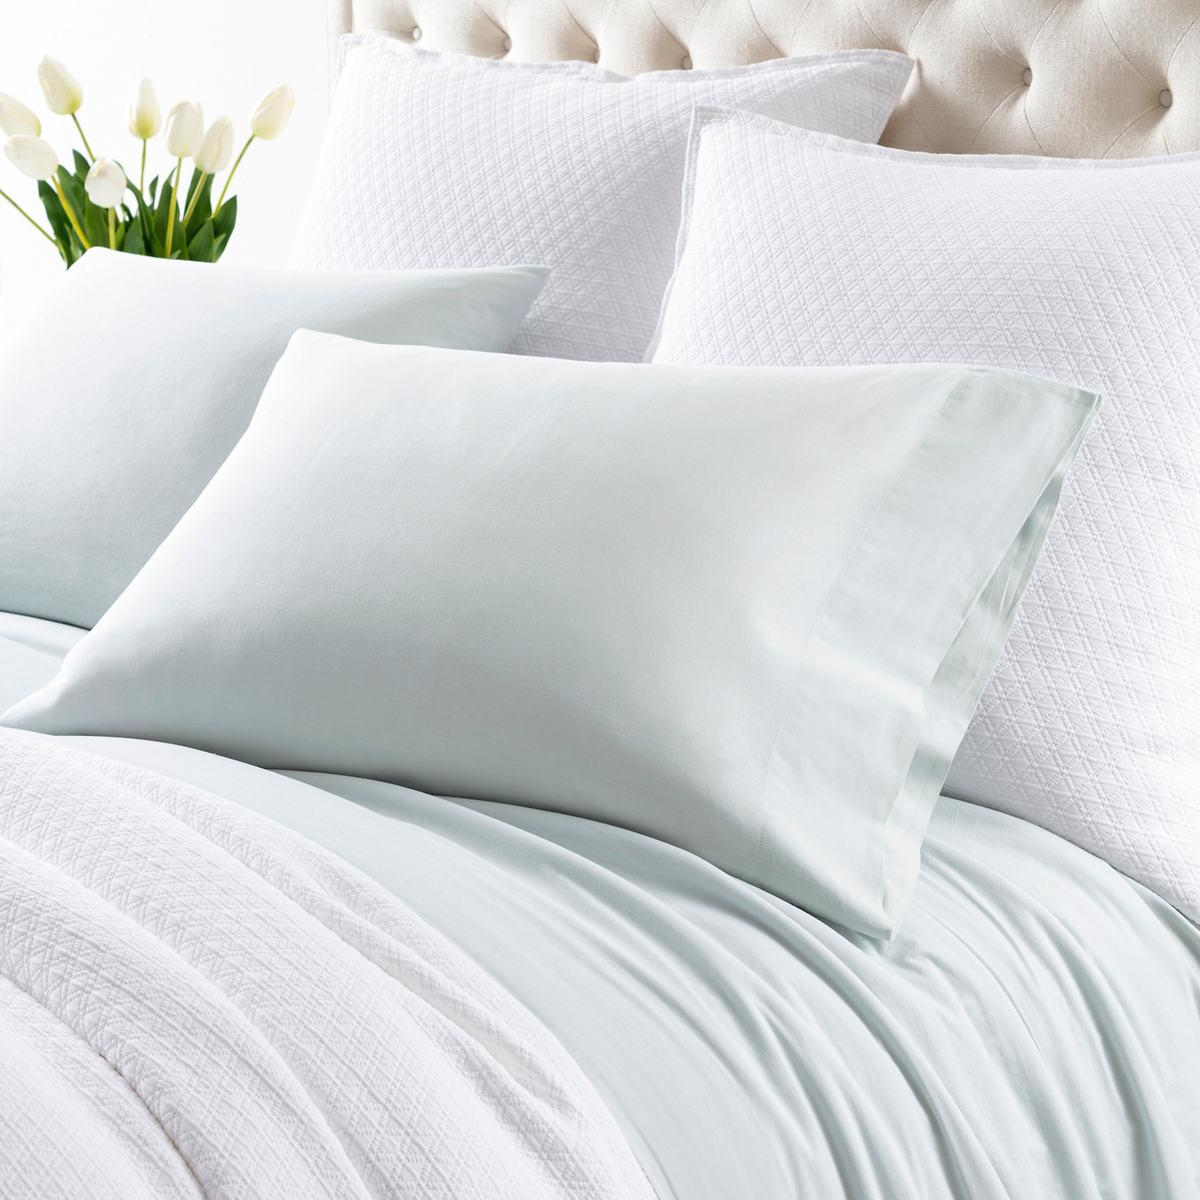 Comfy Cotton Sky Pillowcases